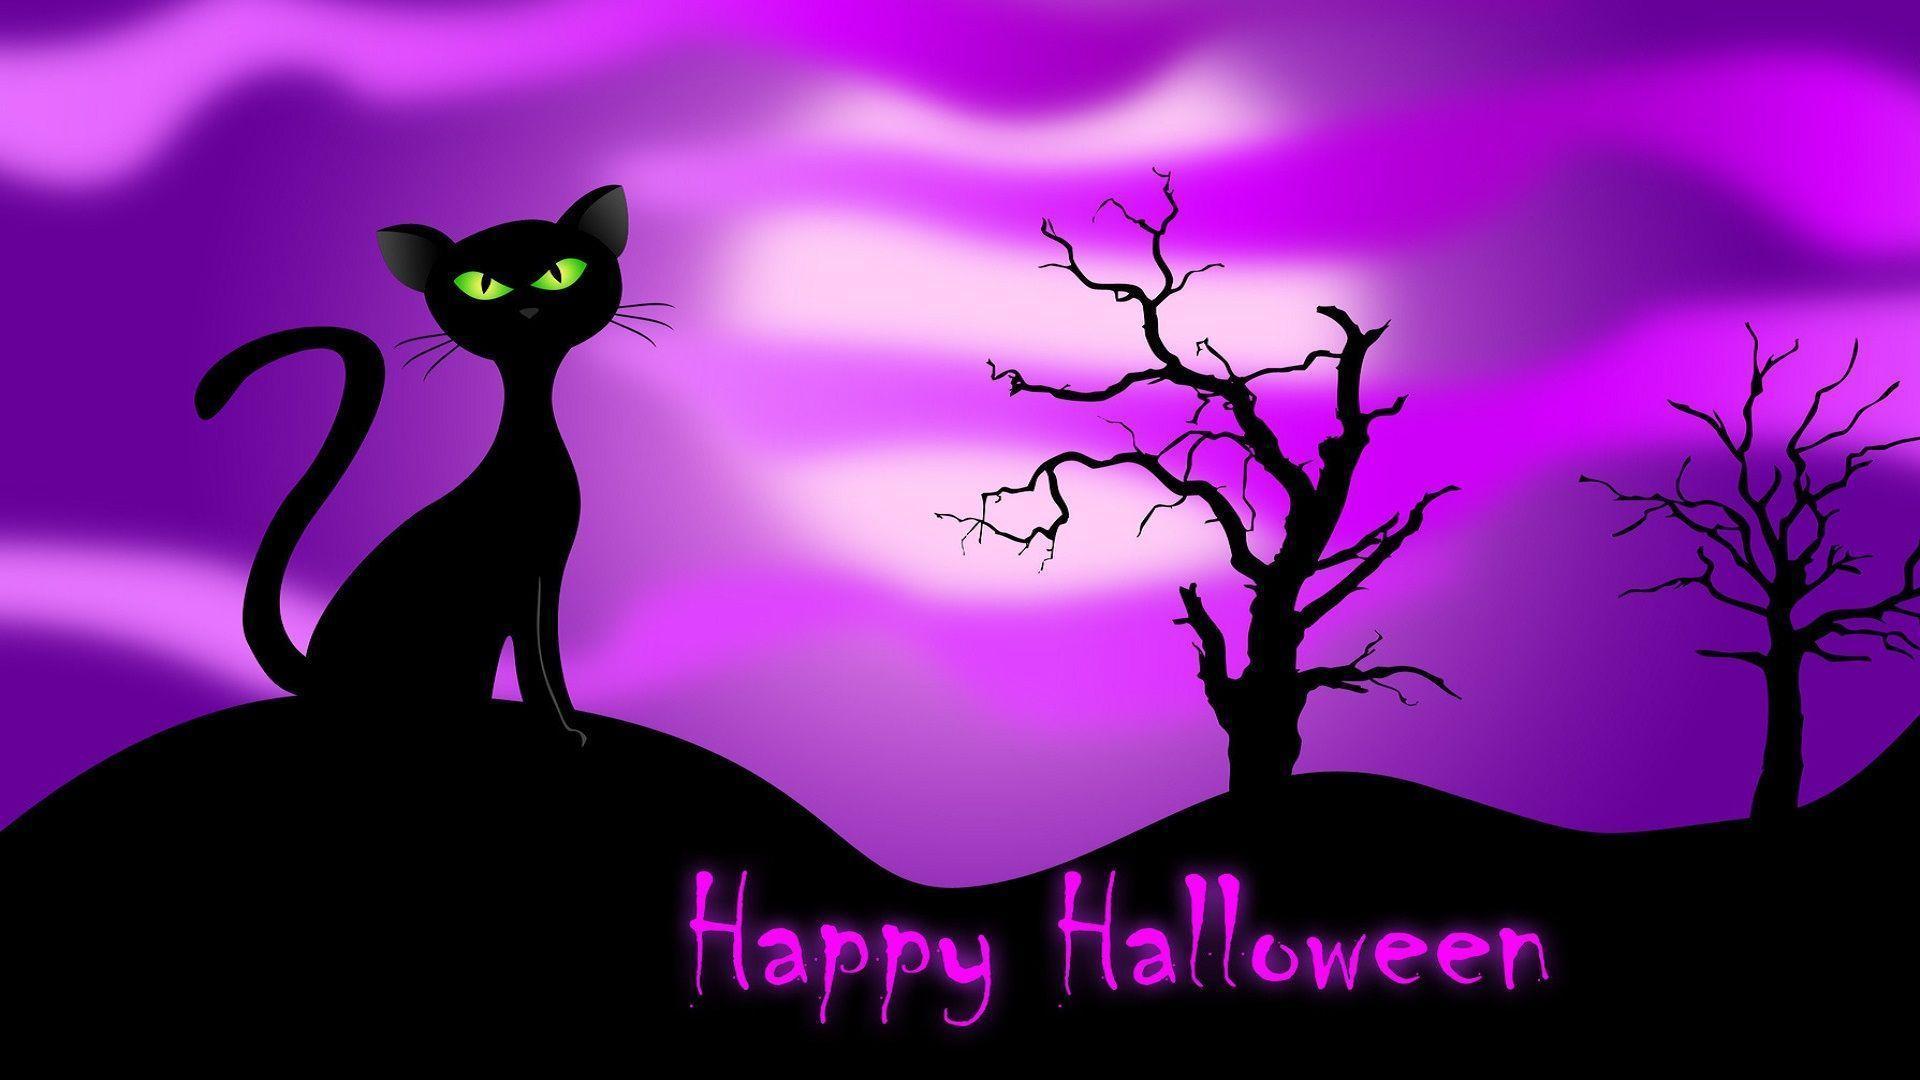 Halloween Wallpaper Thankful